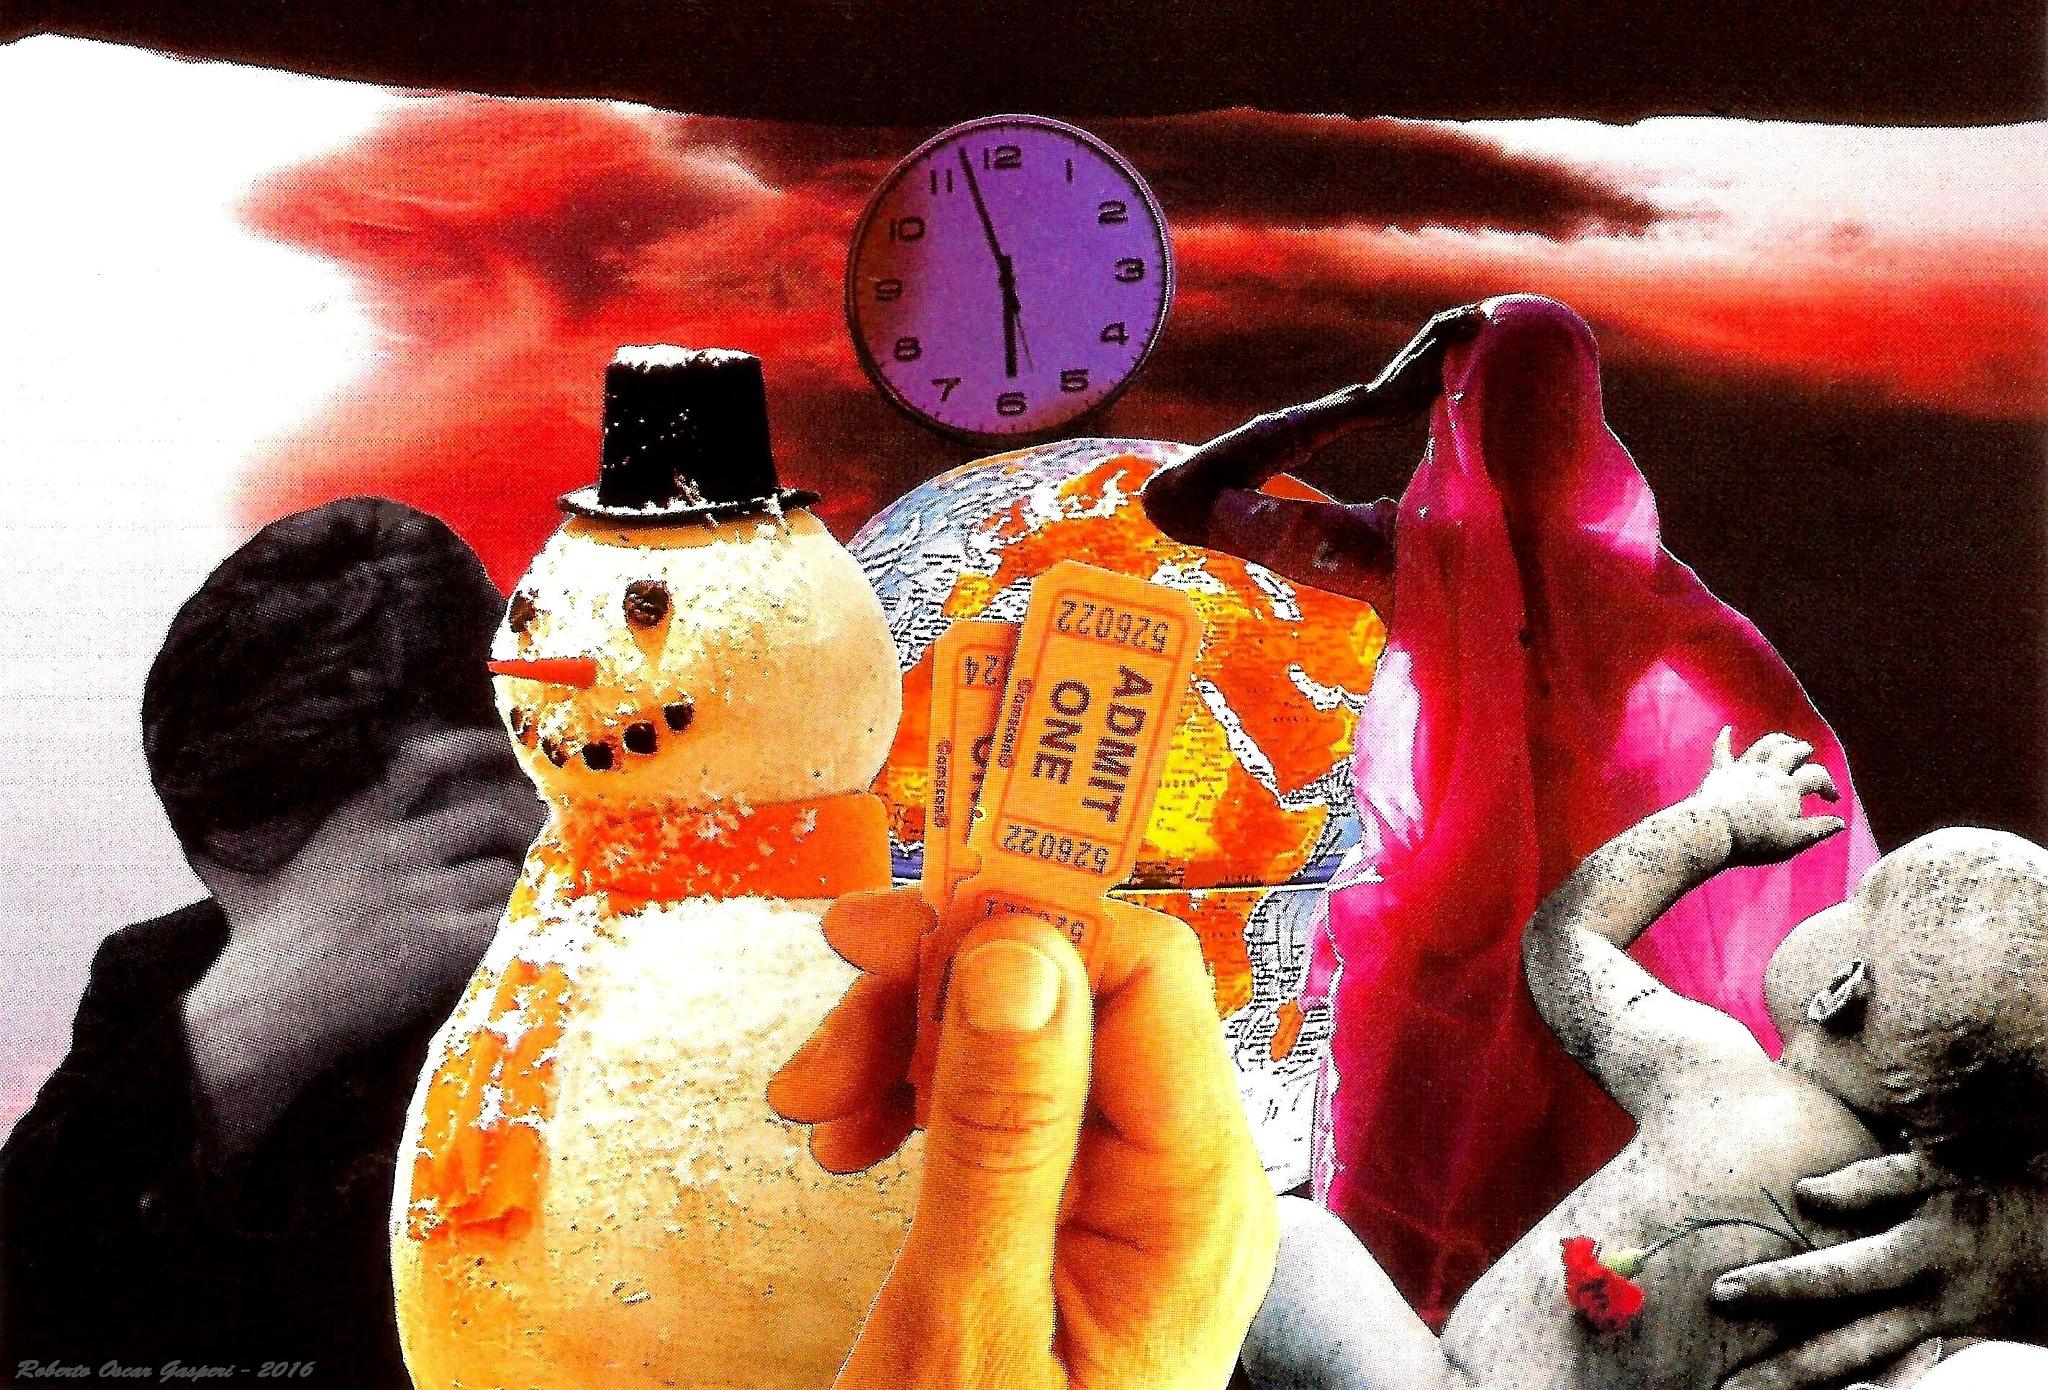 DEADLINE by Roberto Oscar Gasperi